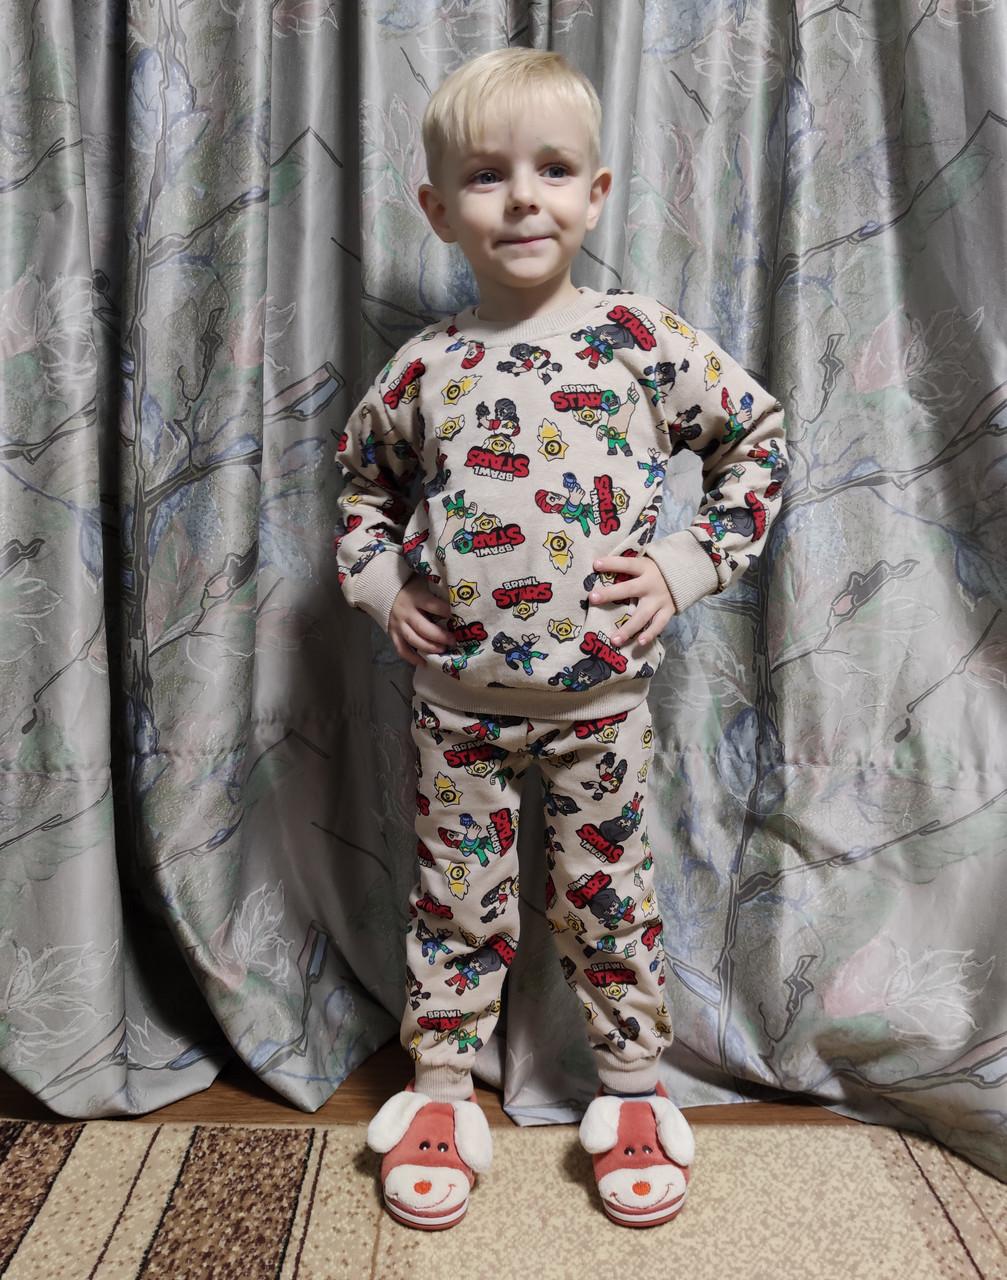 Детская теплая пижама бравл старс пижамка для мальчика Кольт Бравл Старс Brawl stars 2-10 лет